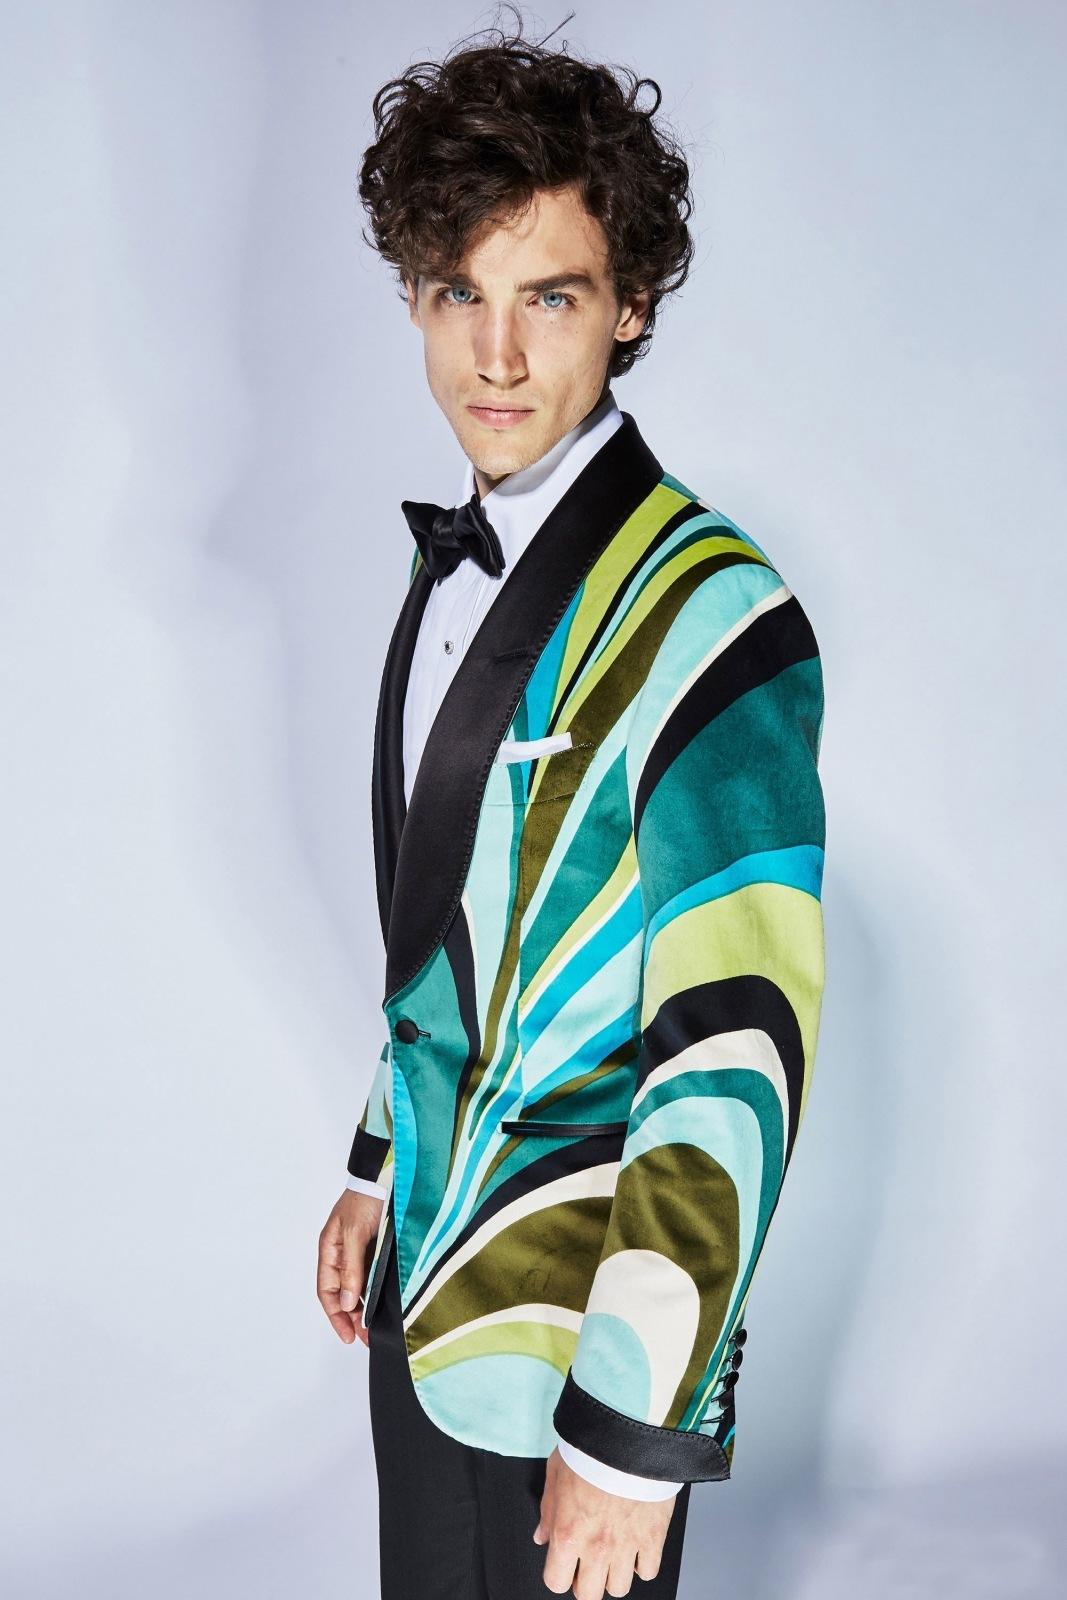 Tom Ford\'s men\'s collection full of Mediterranean tones   Luxury ...